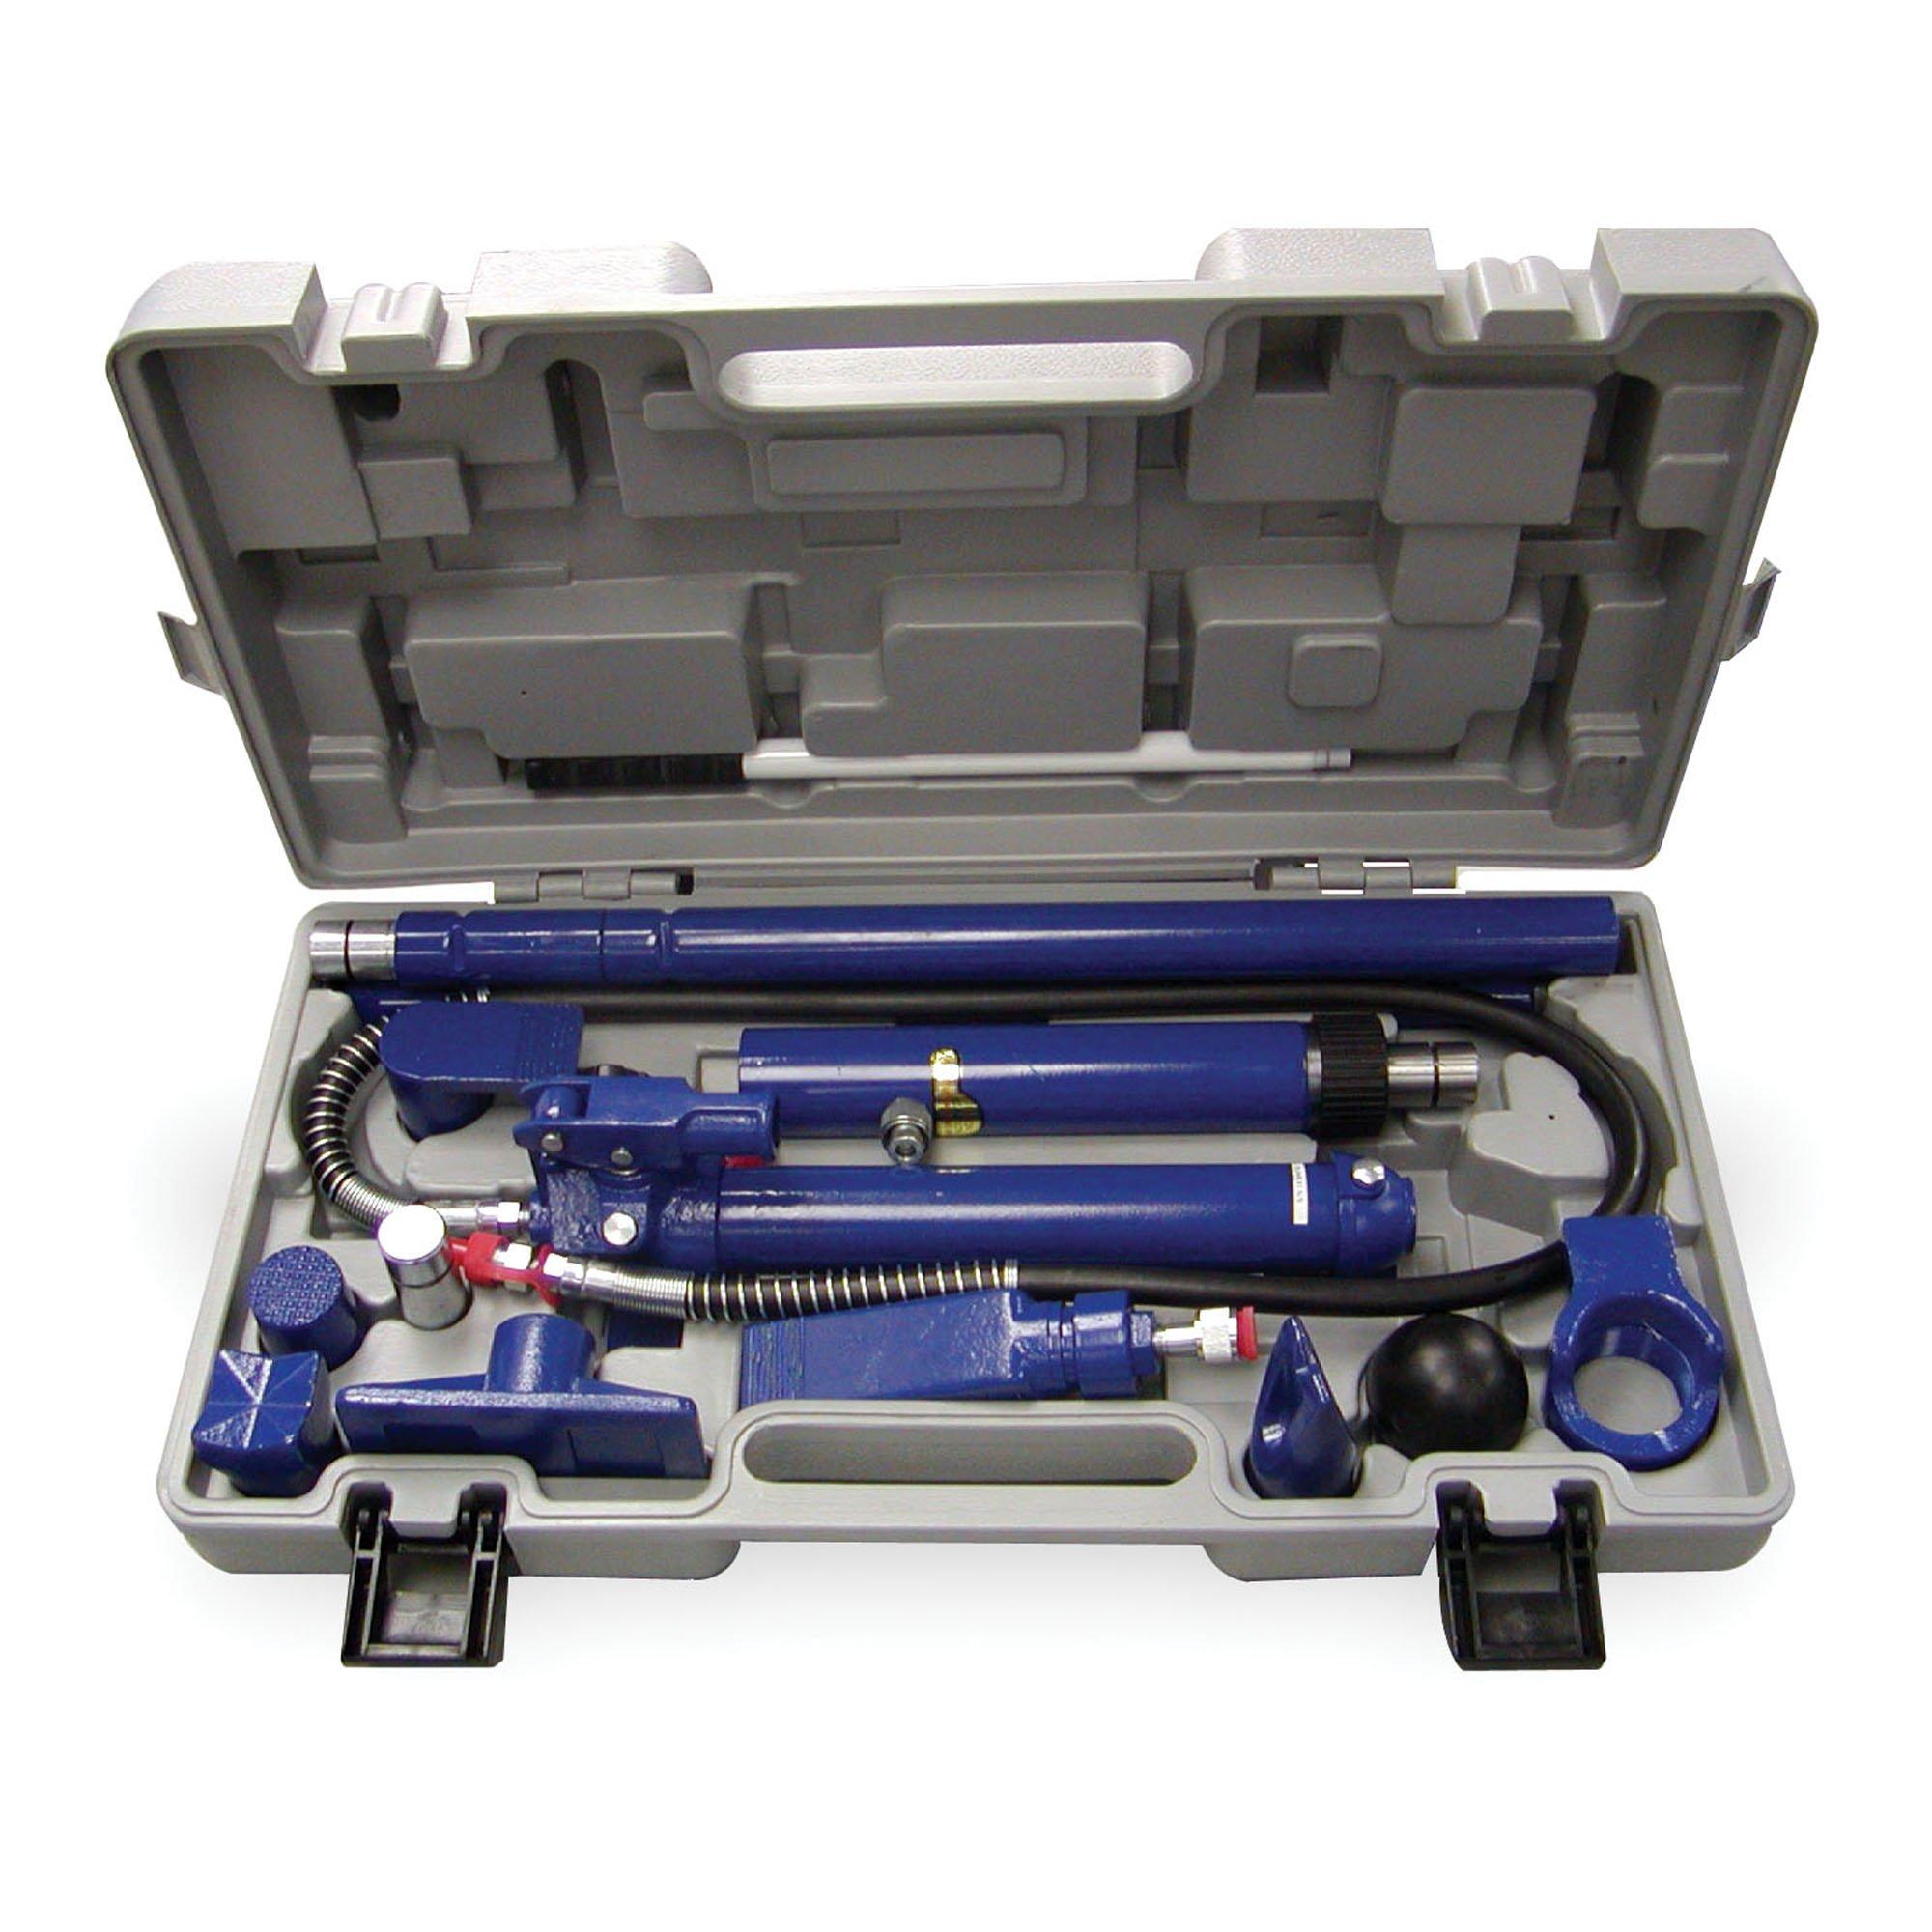 Buffalo Tools BFRK4 Body Frame Repair Kit